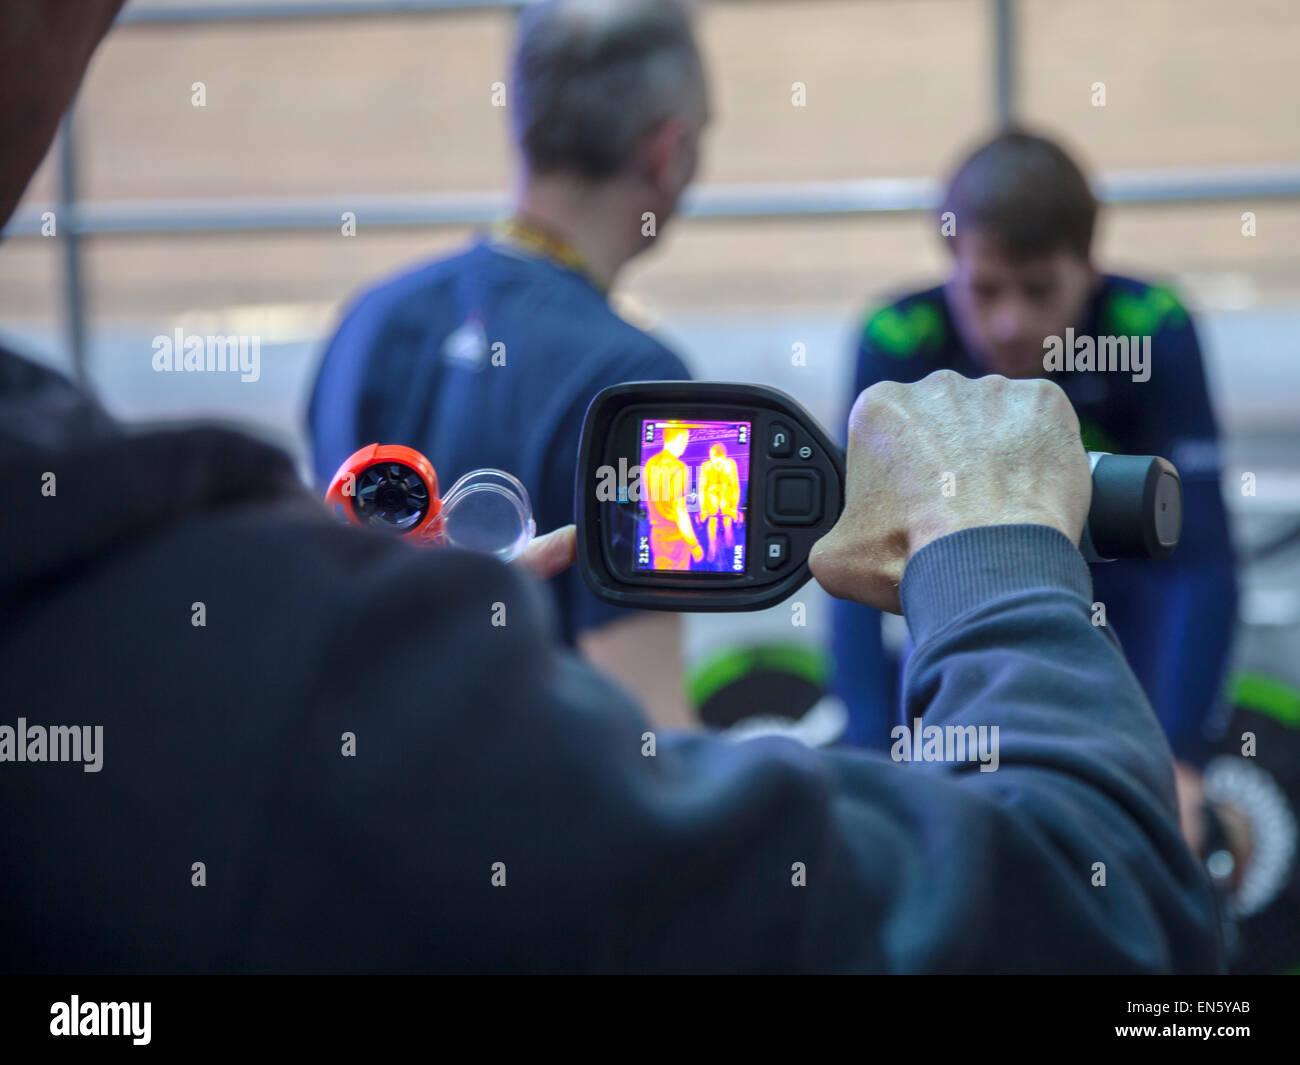 El Velódromo de Manchester, Reino Unido. El 28 de abril, 2015. Alex Dowsett Team Movistar realizar pruebas Imagen De Stock